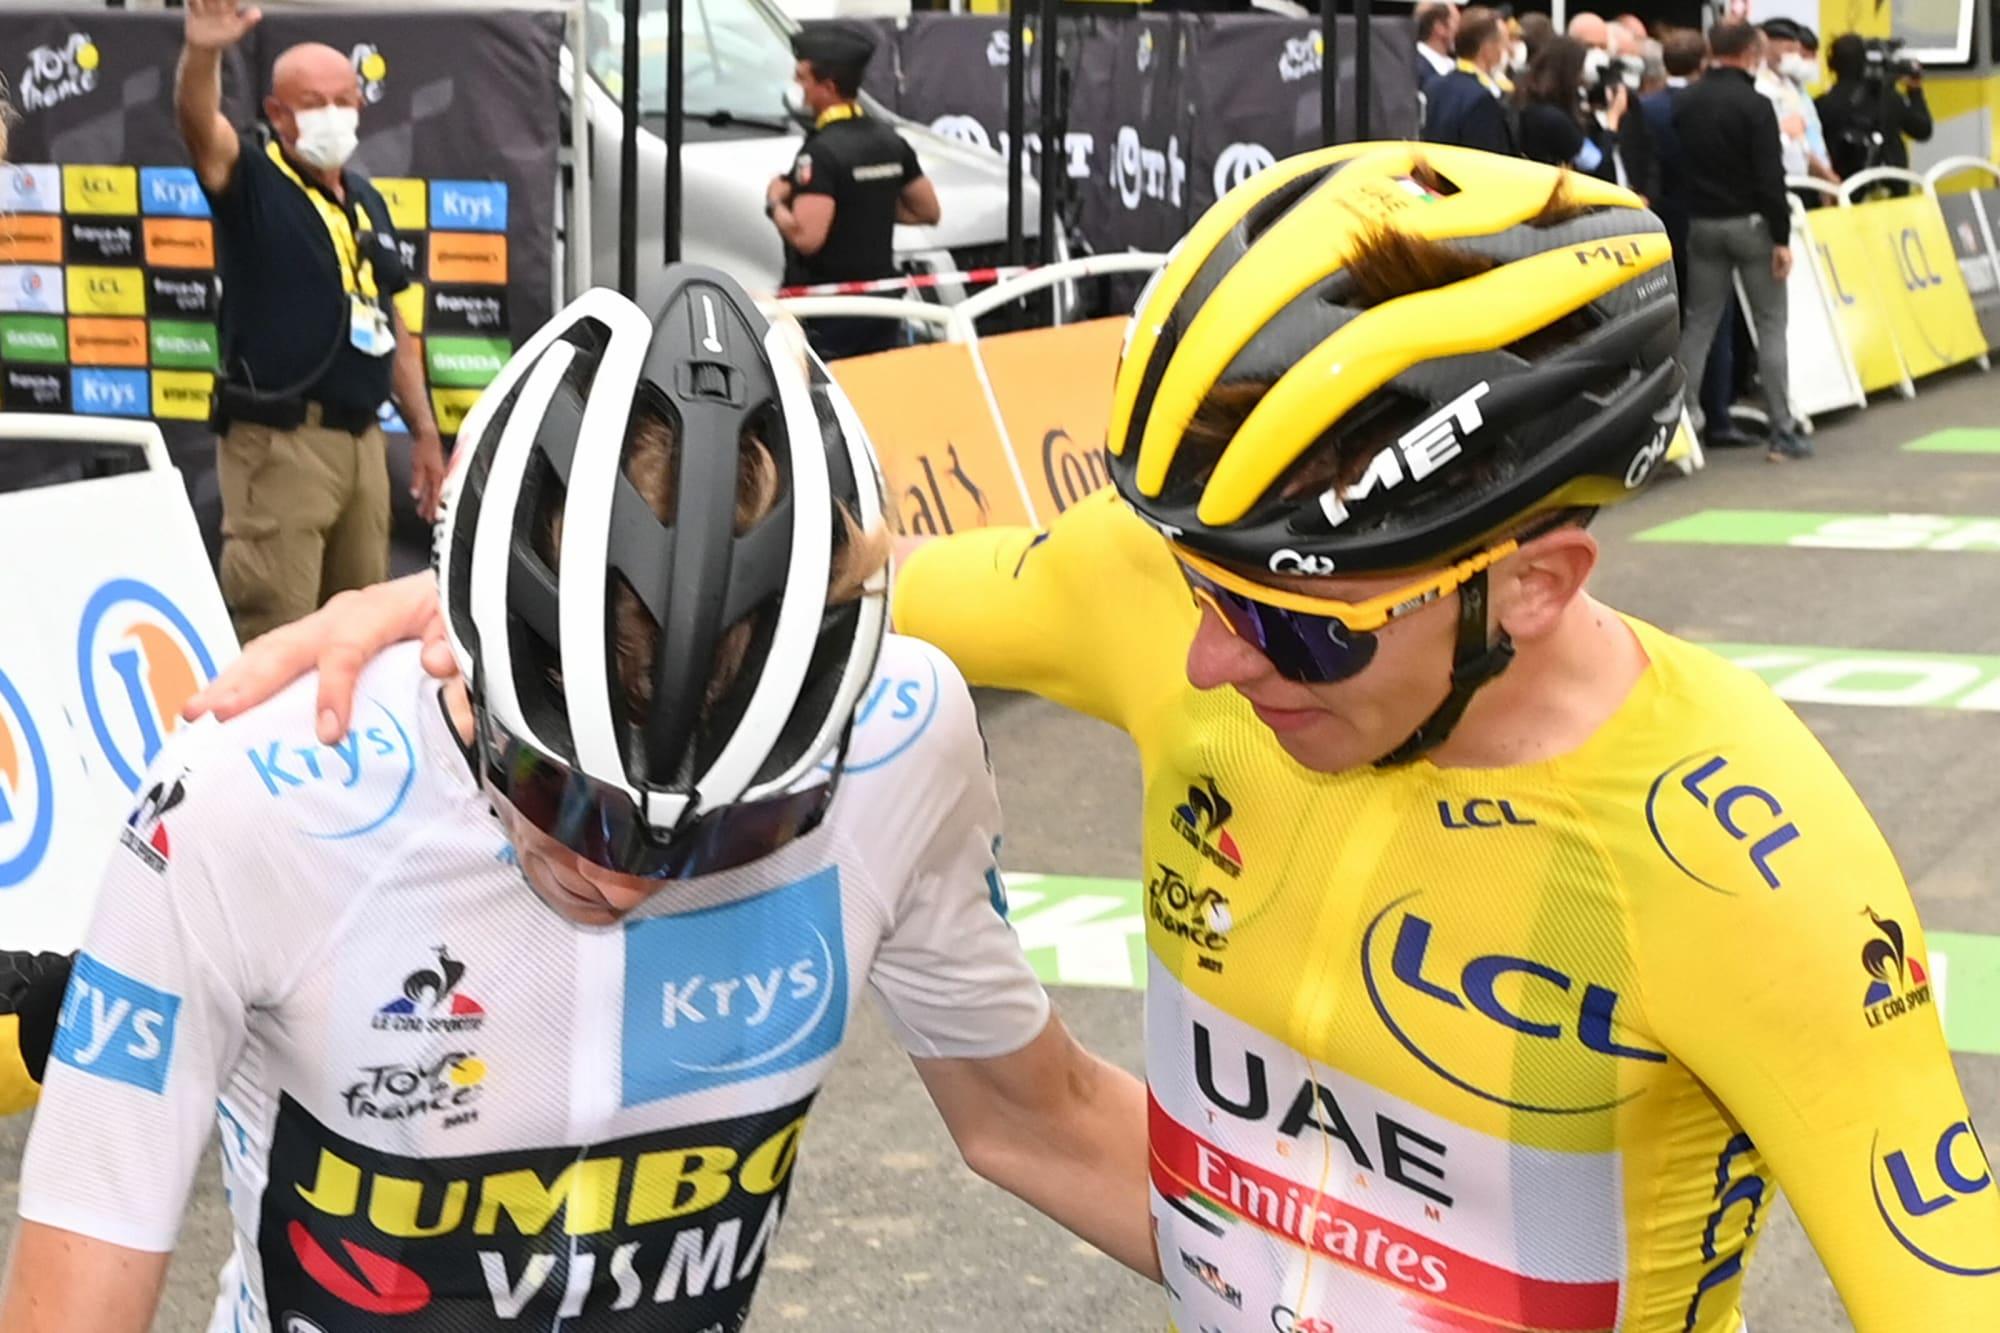 Tour de France jersey leads cemented as Tadej Pogacar wins Stage 18